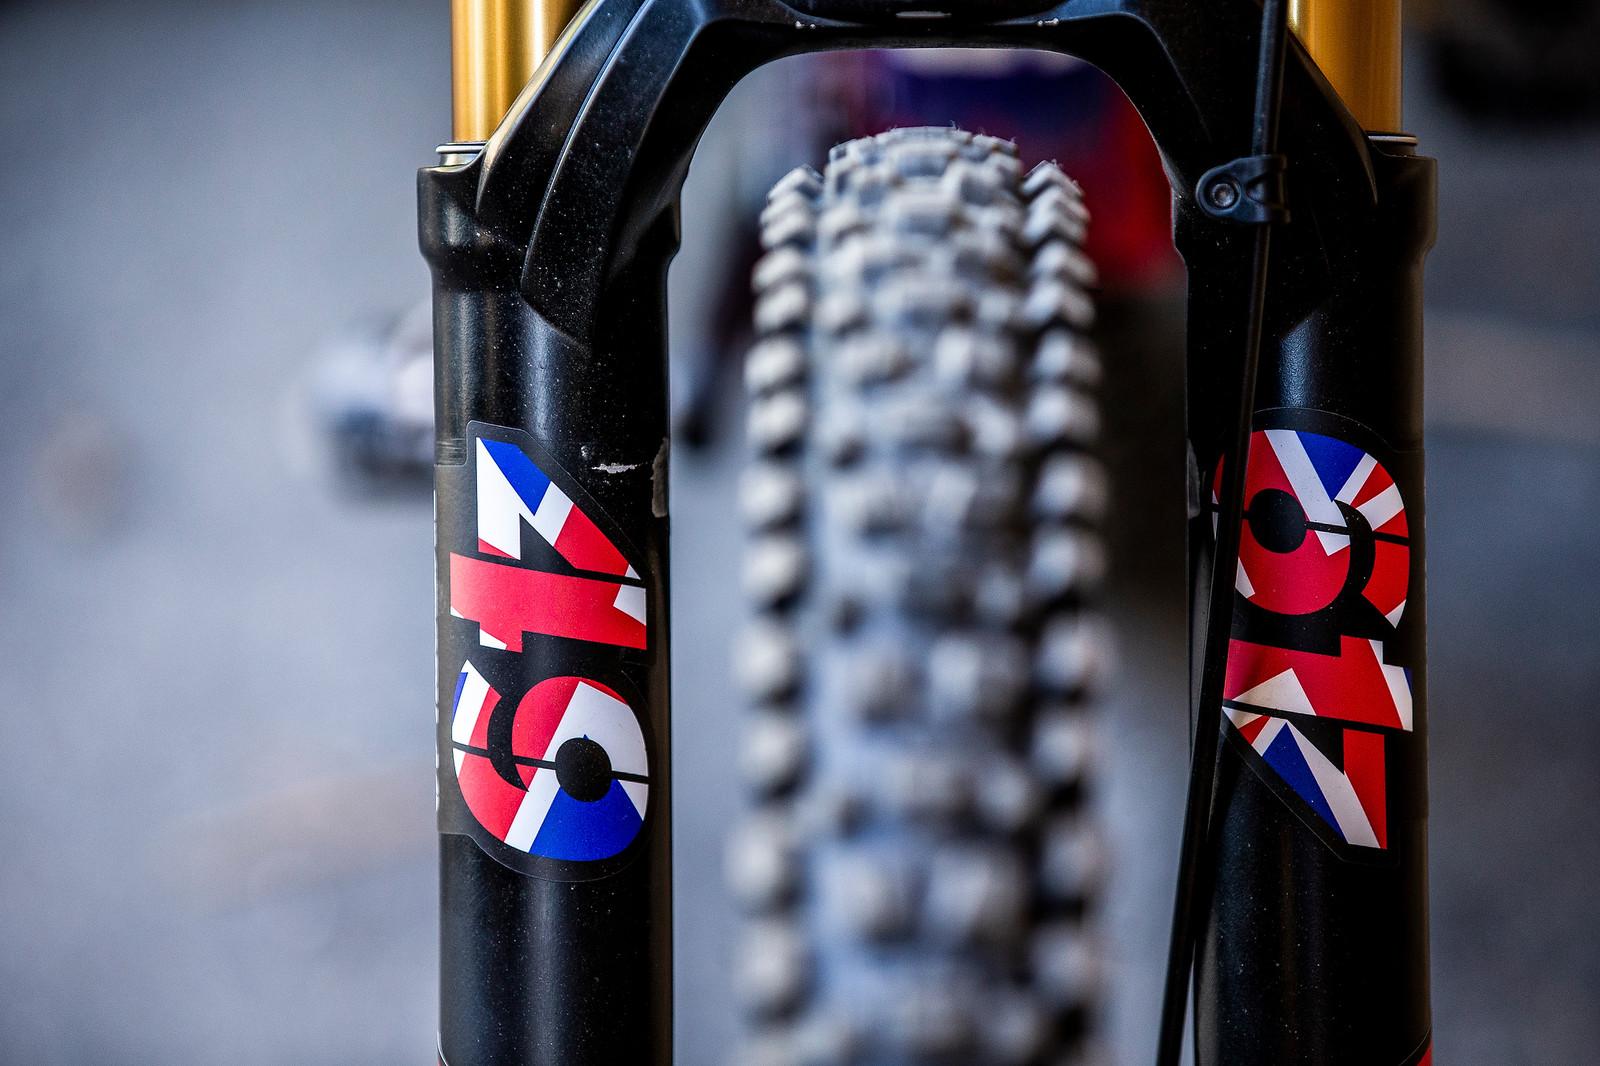 Custom Stickers - WORLD CHAMPS BIKE - Matt Walker's Saracen Myst - Mountain Biking Pictures - Vital MTB